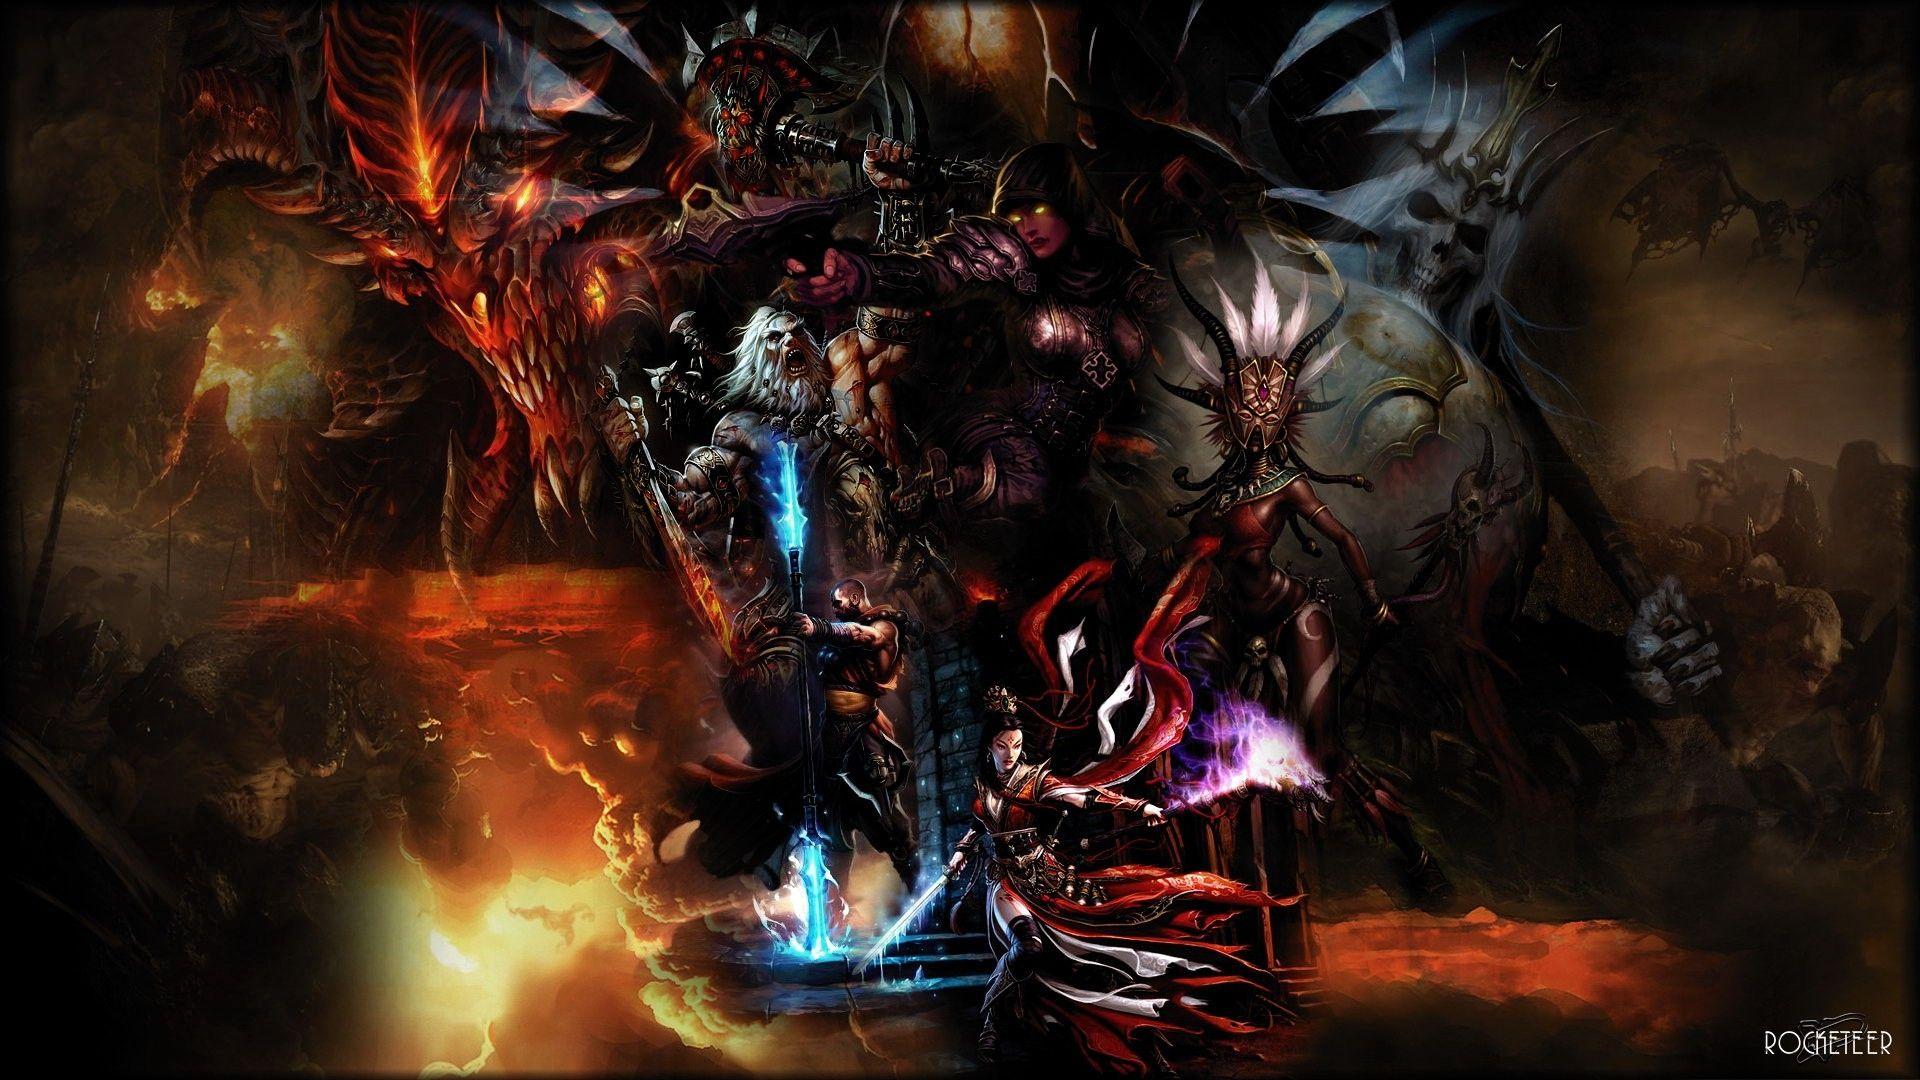 Stunning Diablo 3 Characters Magic Light Faces Diablo Wallpaper Kuff Games Diablo Rpg Fantasia